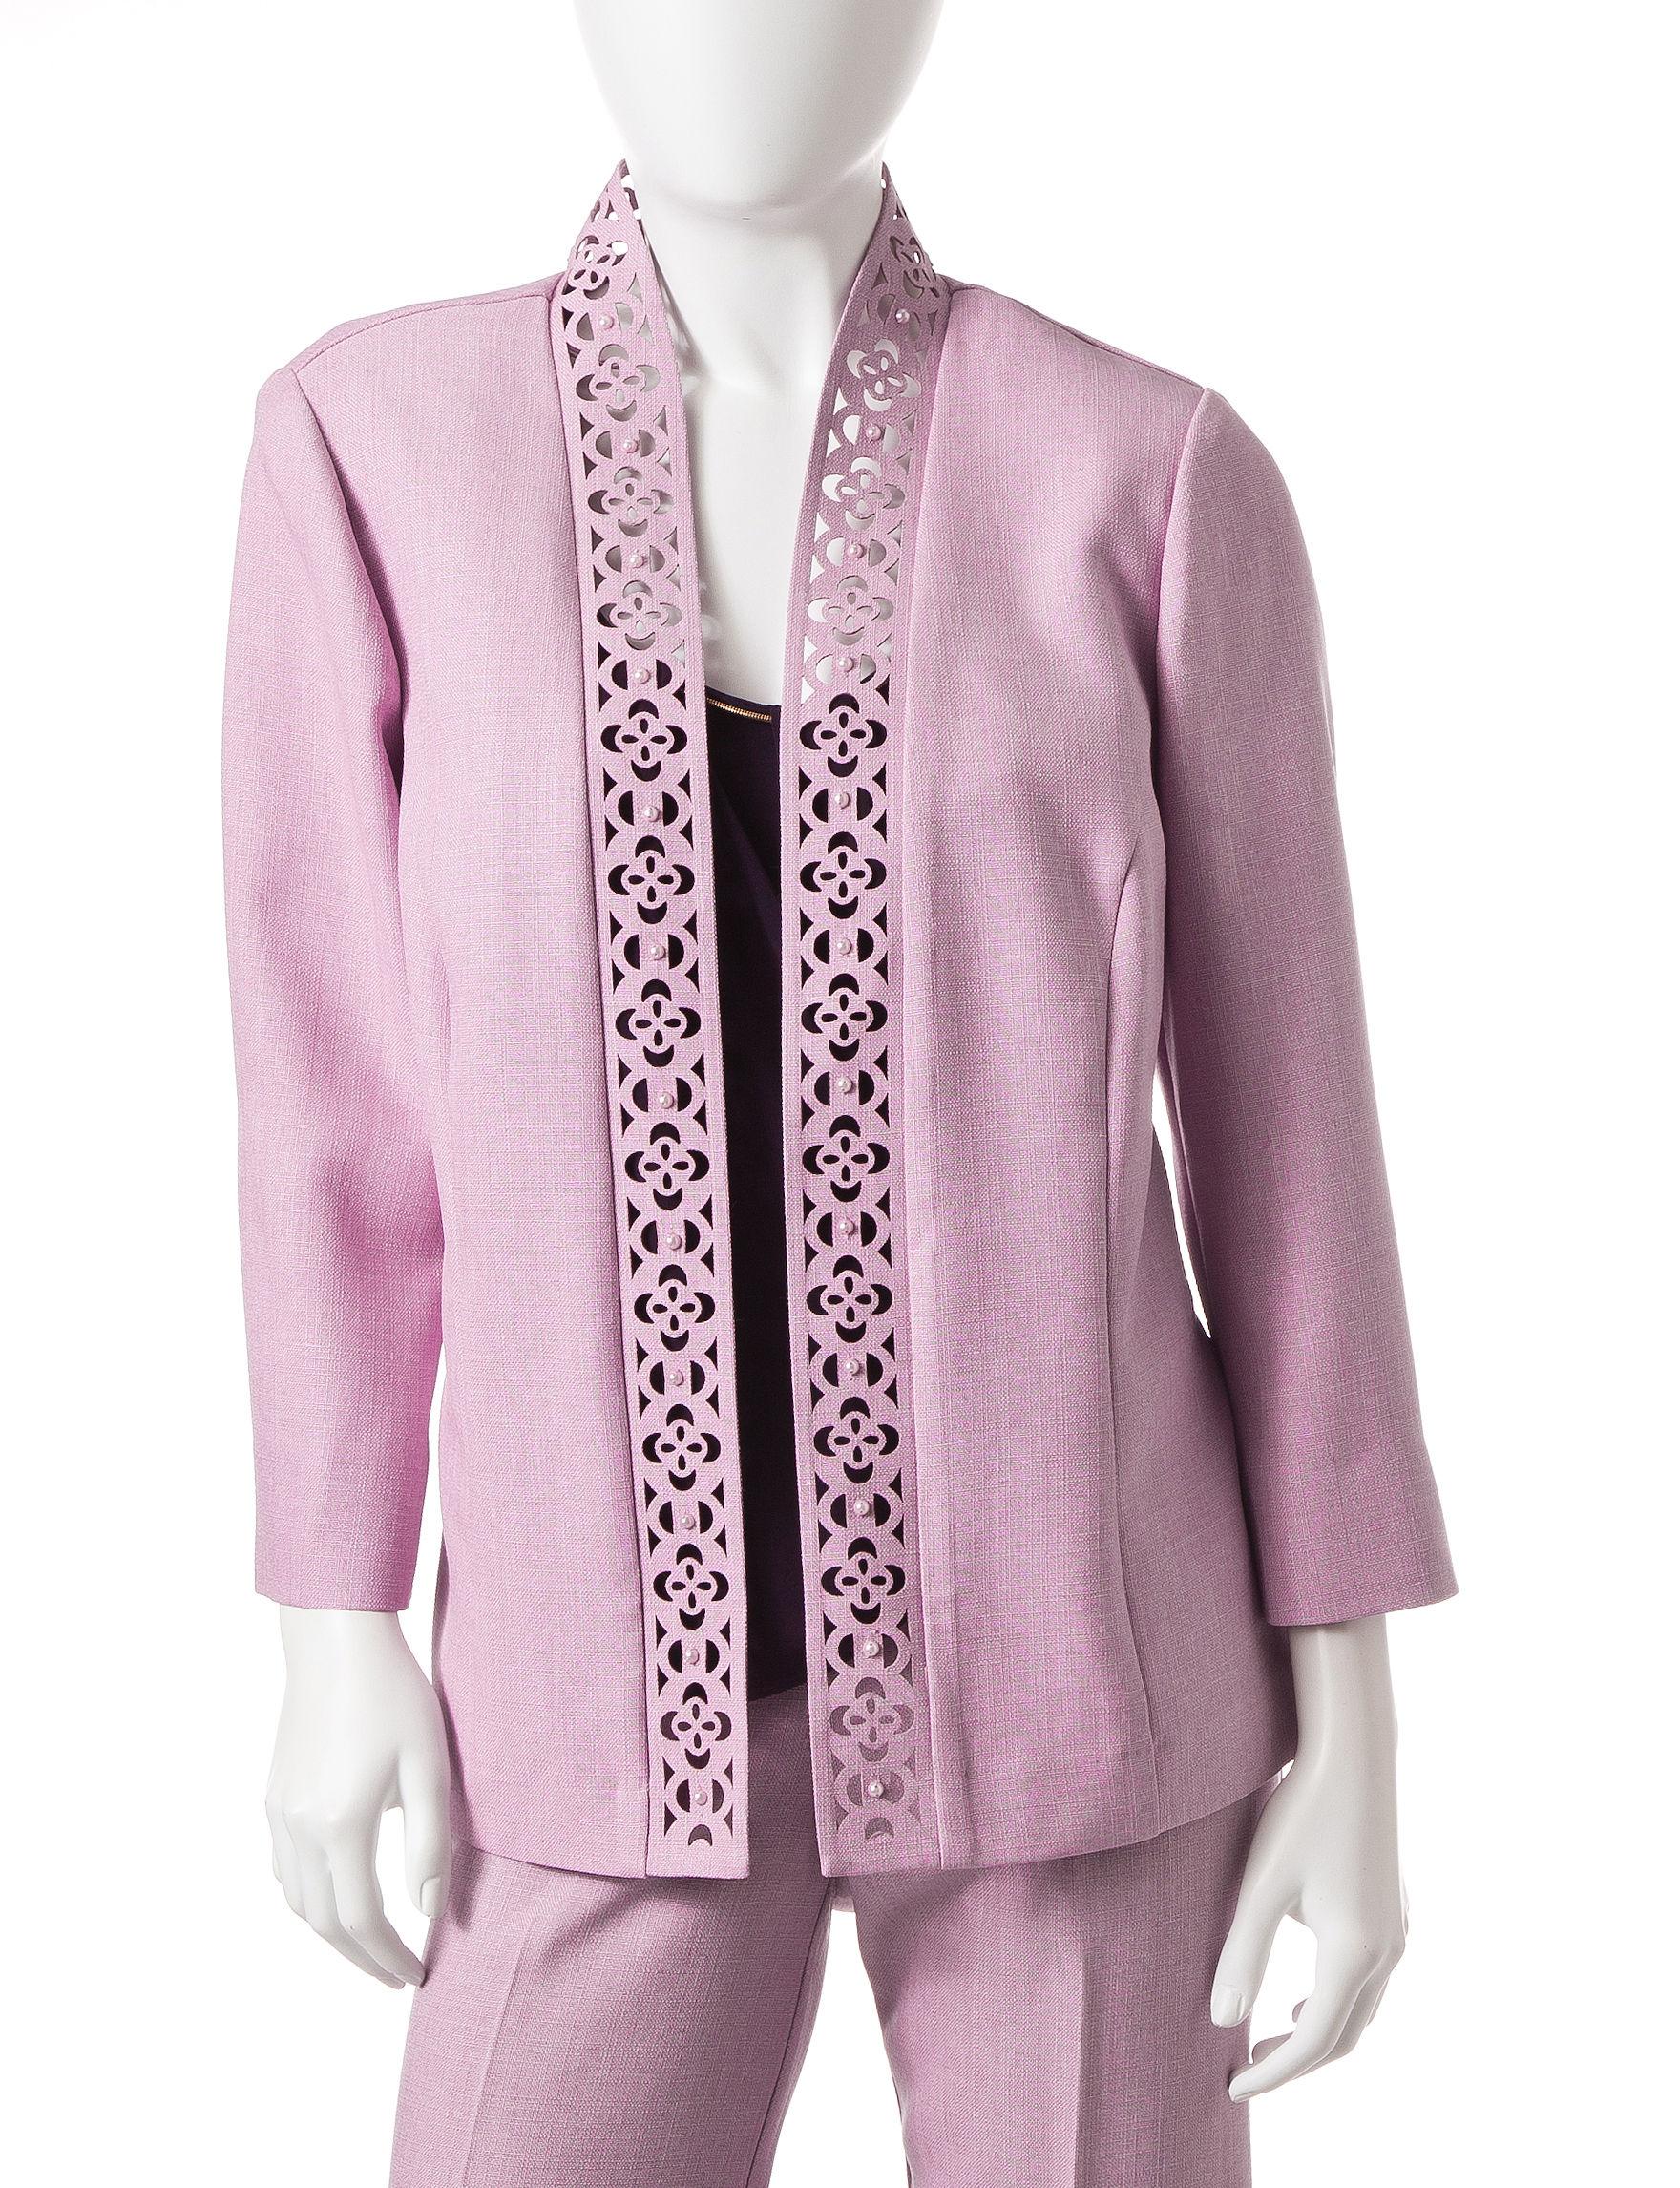 Alfred Dunner Lavender Lightweight Jackets & Blazers